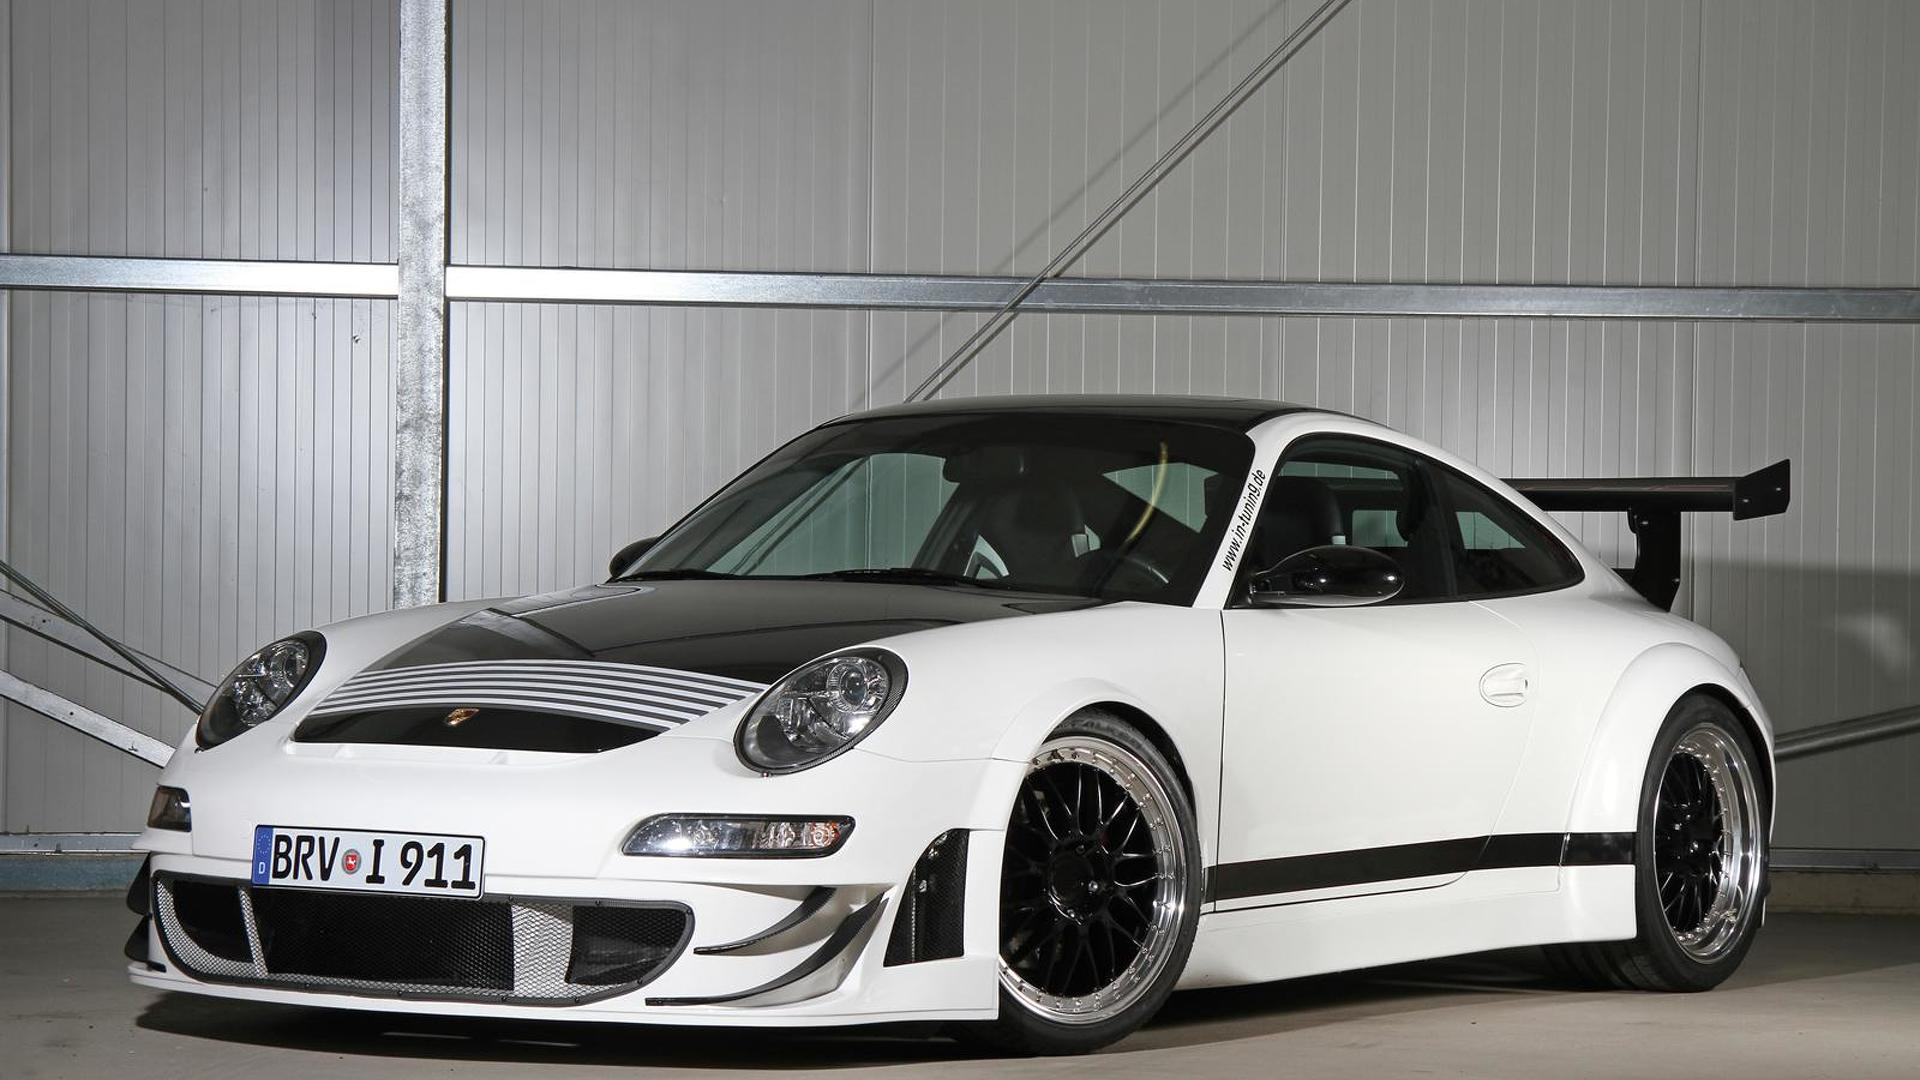 Тюнинг Porsche 911 в кузове 997 от Ingo Noak